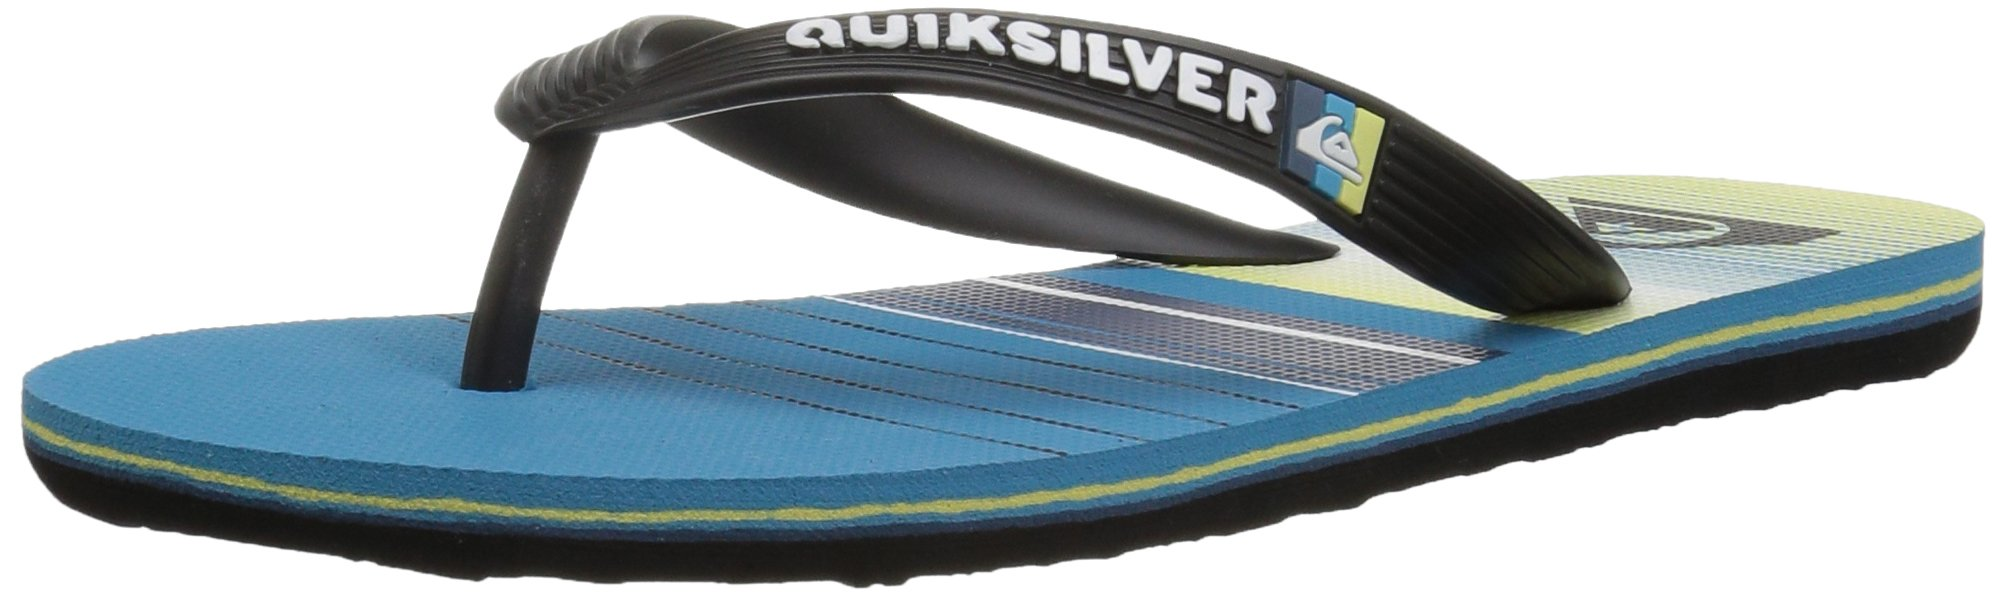 Quiksilver Boys' Molokai SWELL Vision Youth Sandal Black Blue, 1(32) M US Little Kid